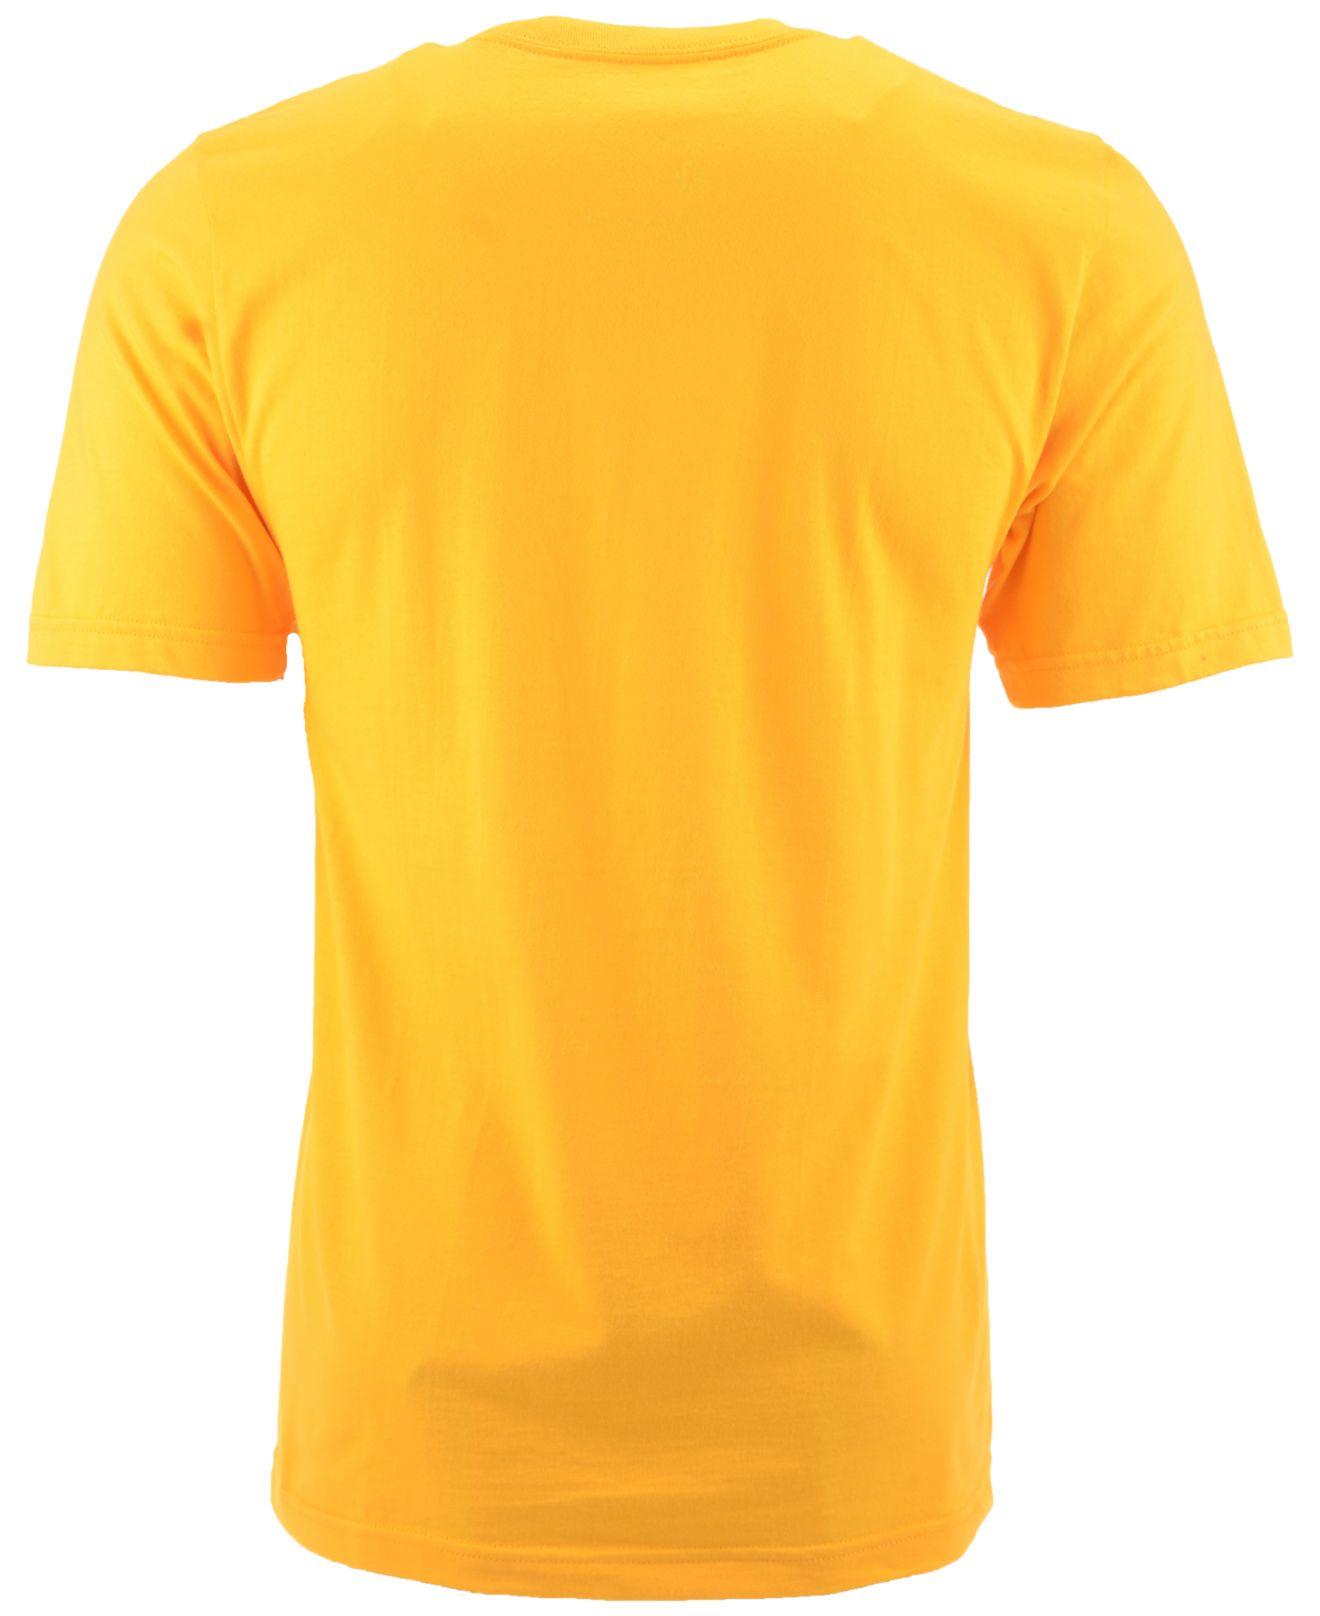 9d8fe5780 Lyst - Nike Men s Short-sleeve Wyoming Cowboys T-shirt in Metallic ...